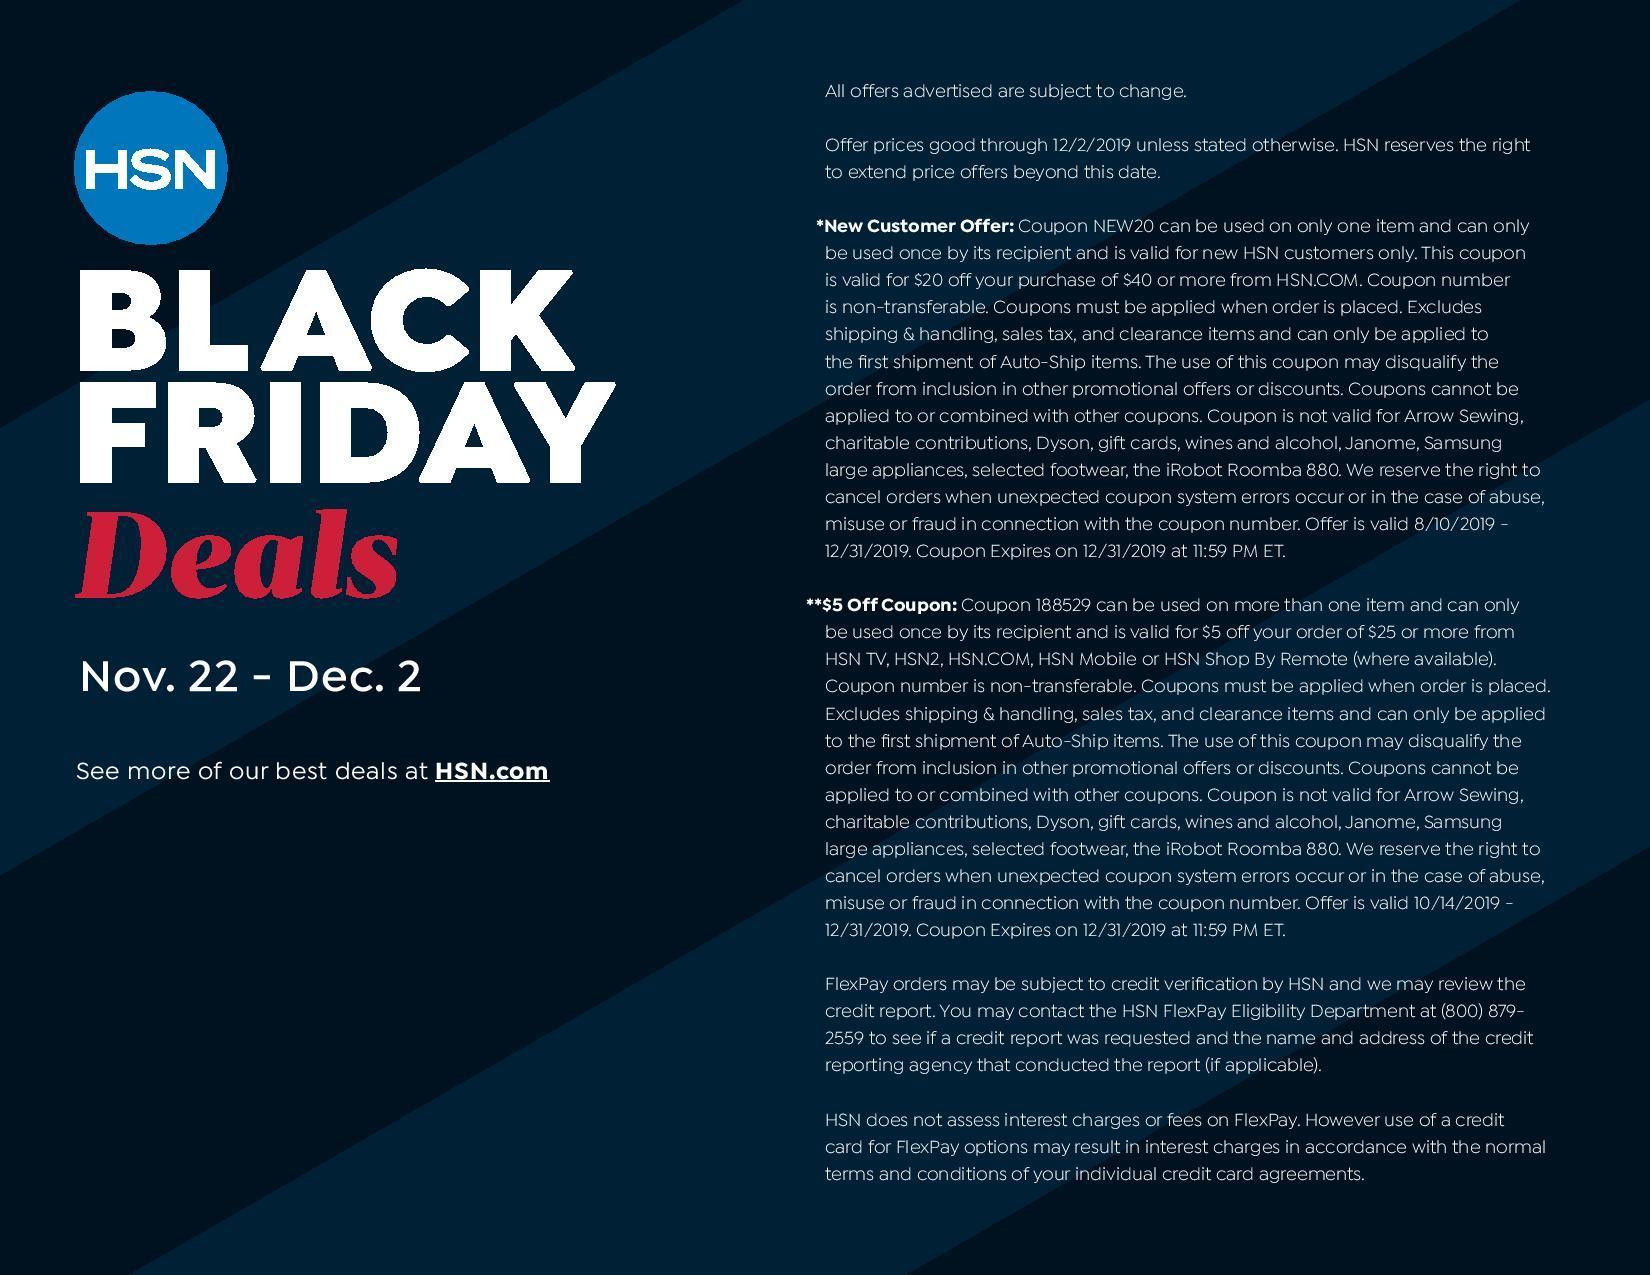 HSN Black Friday Ads